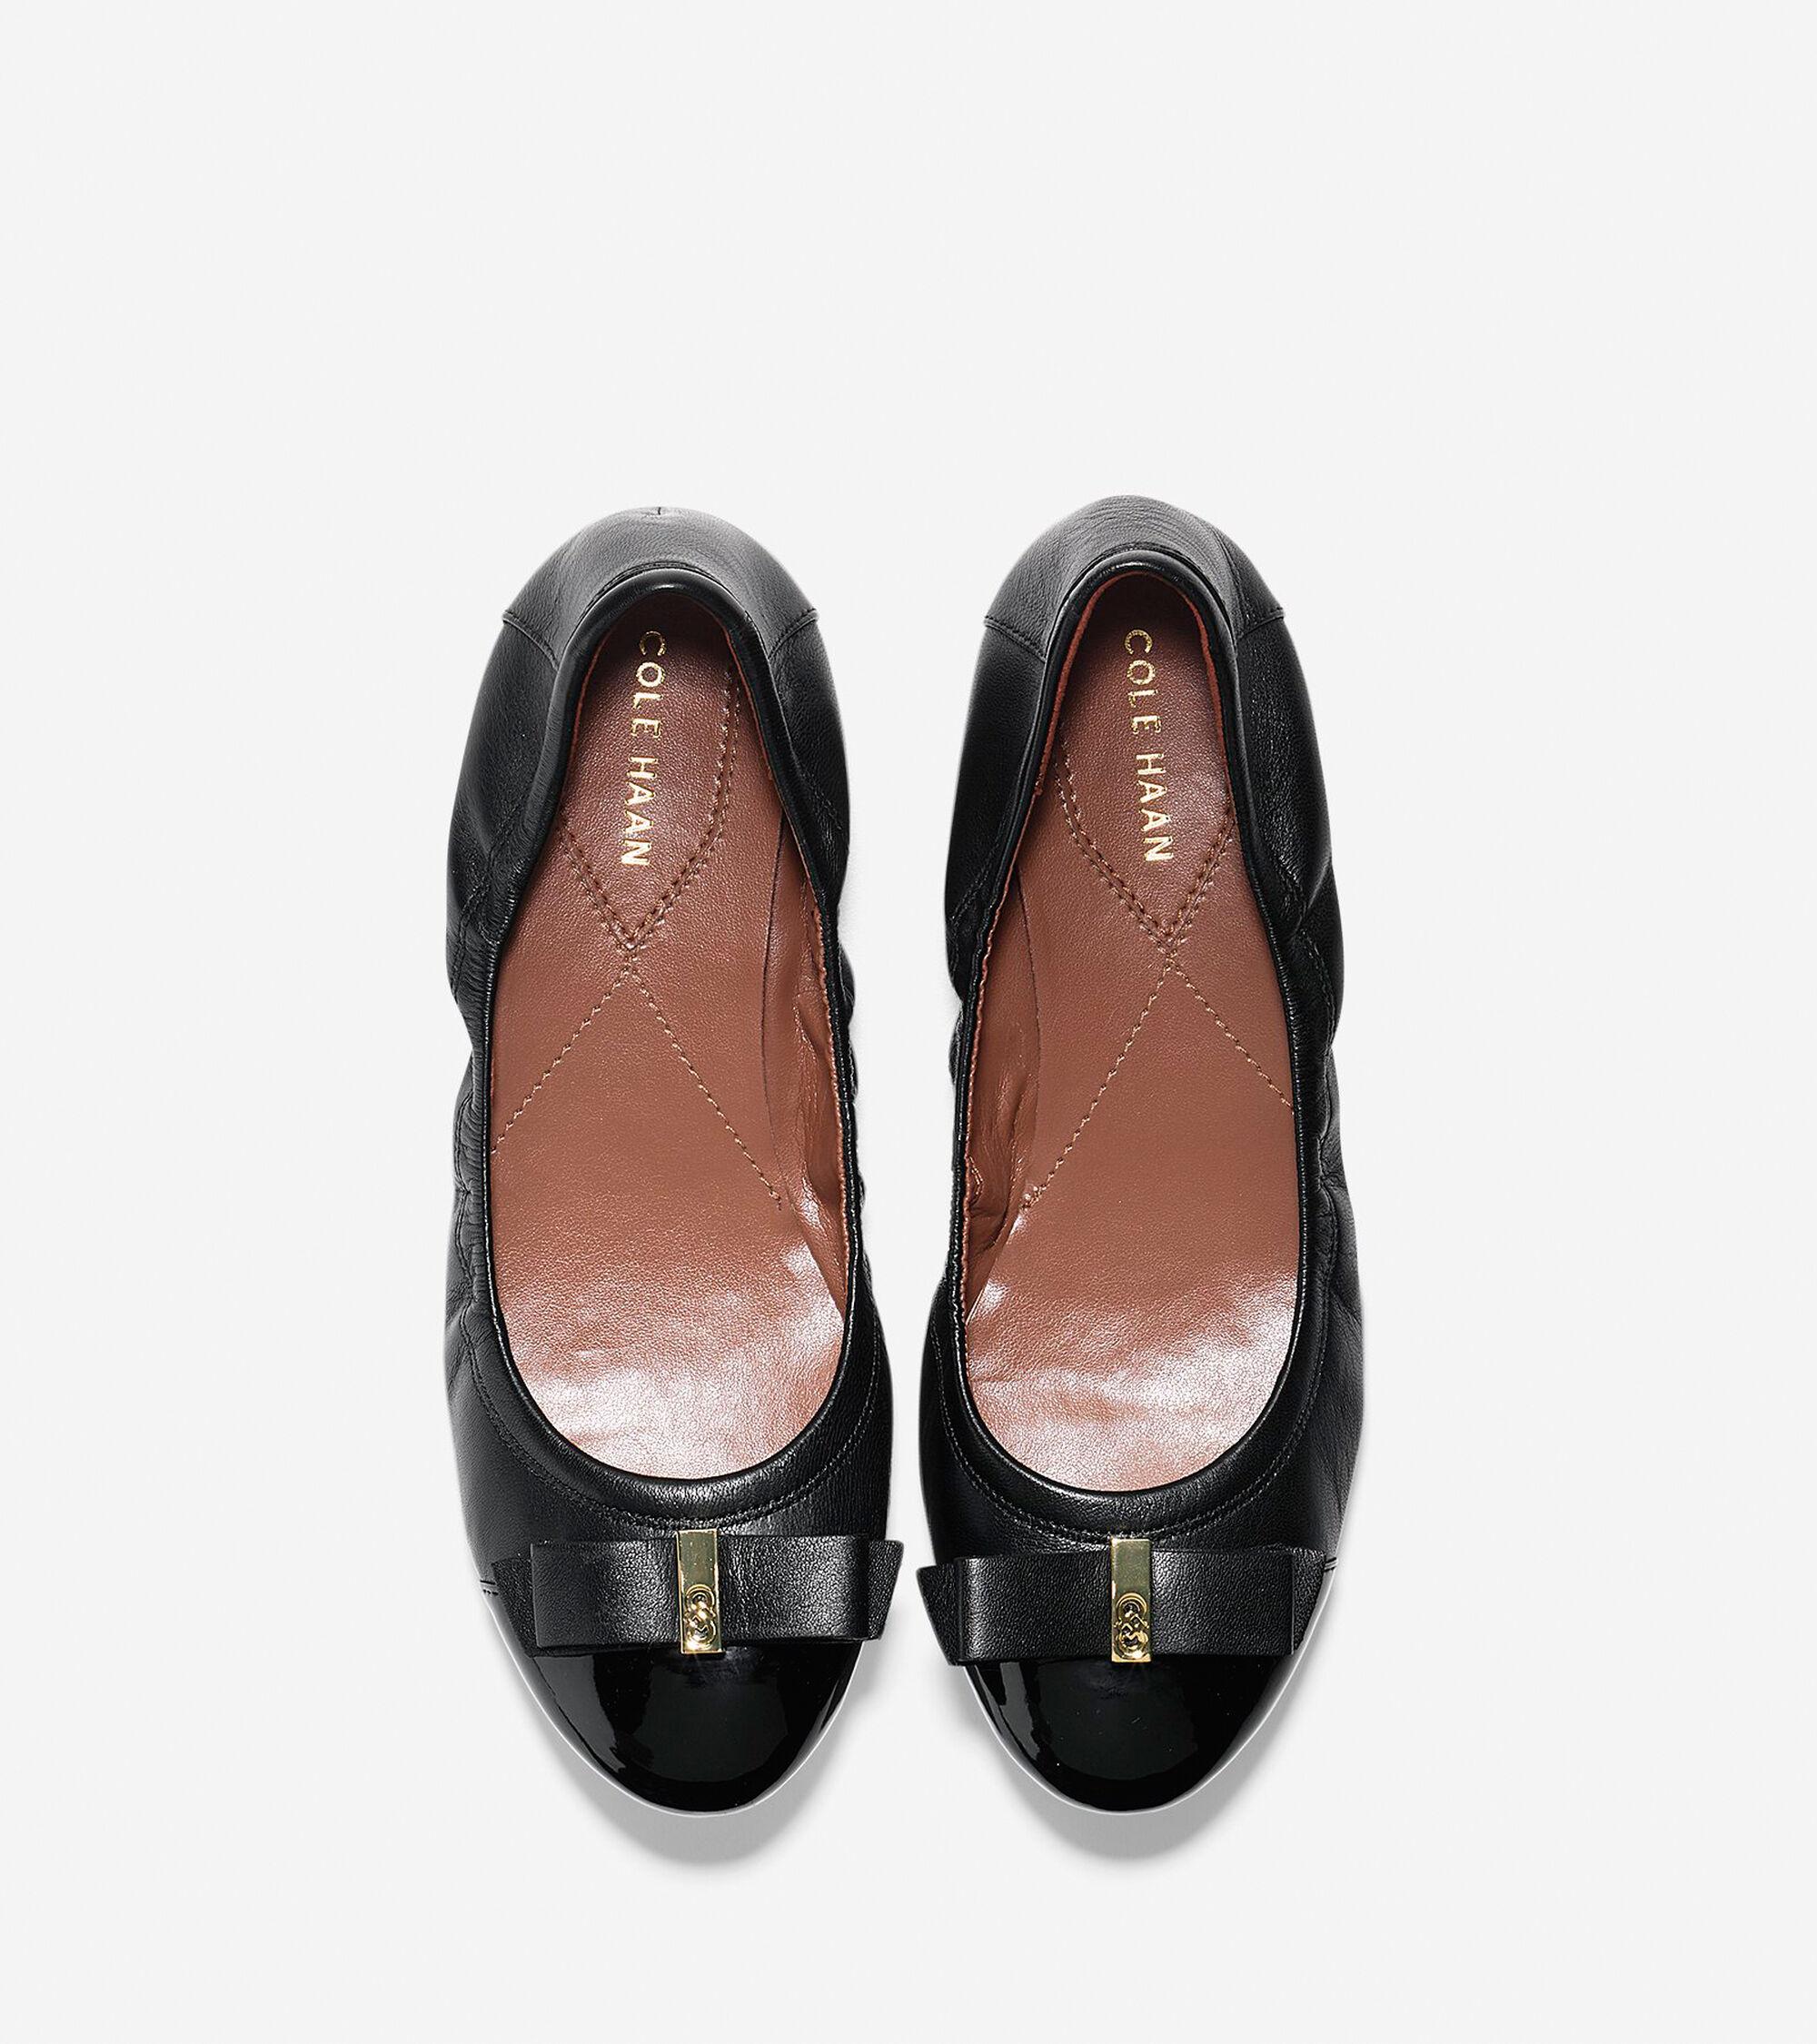 e327cc010f2b Women s Elsie Ballet Flats in Black-Black Patent